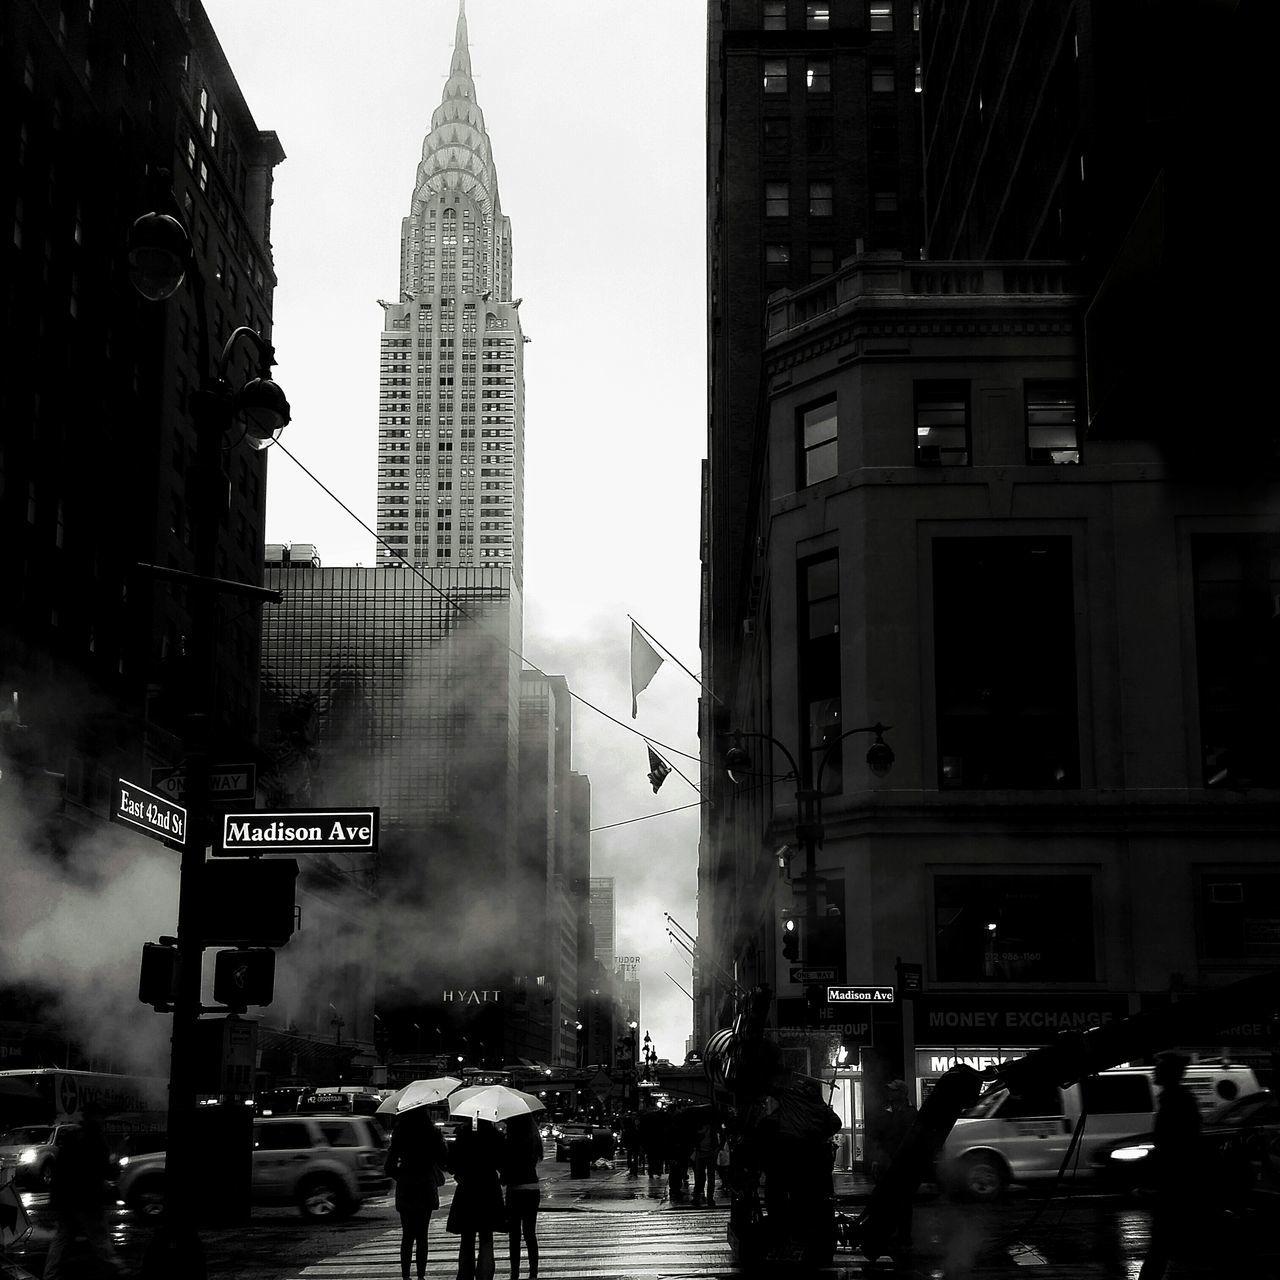 New York Street Protography First Eyeem Photo Chrysler Building Blackandwhite Photography Streetphoto_bw EyeEm Best Shots - Black + White The Street Photographer - 2015 EyeEm Awards Blackandwhite